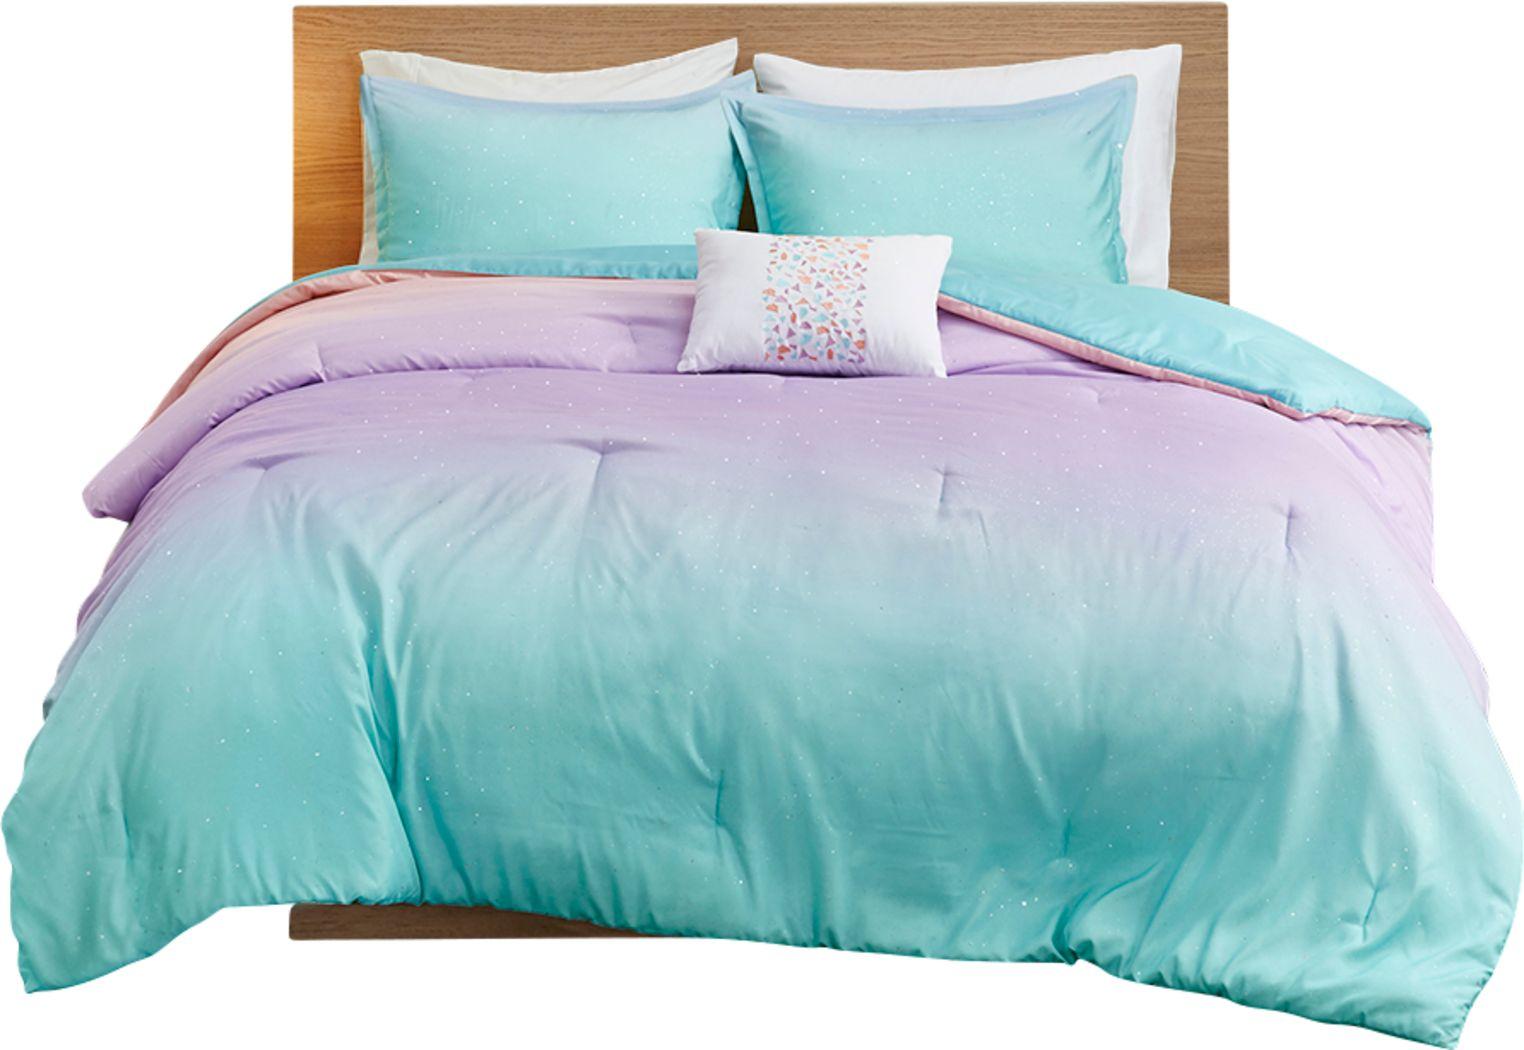 Kids Candy Ombre Aqua 3 Pc Twin XL Comforter Set